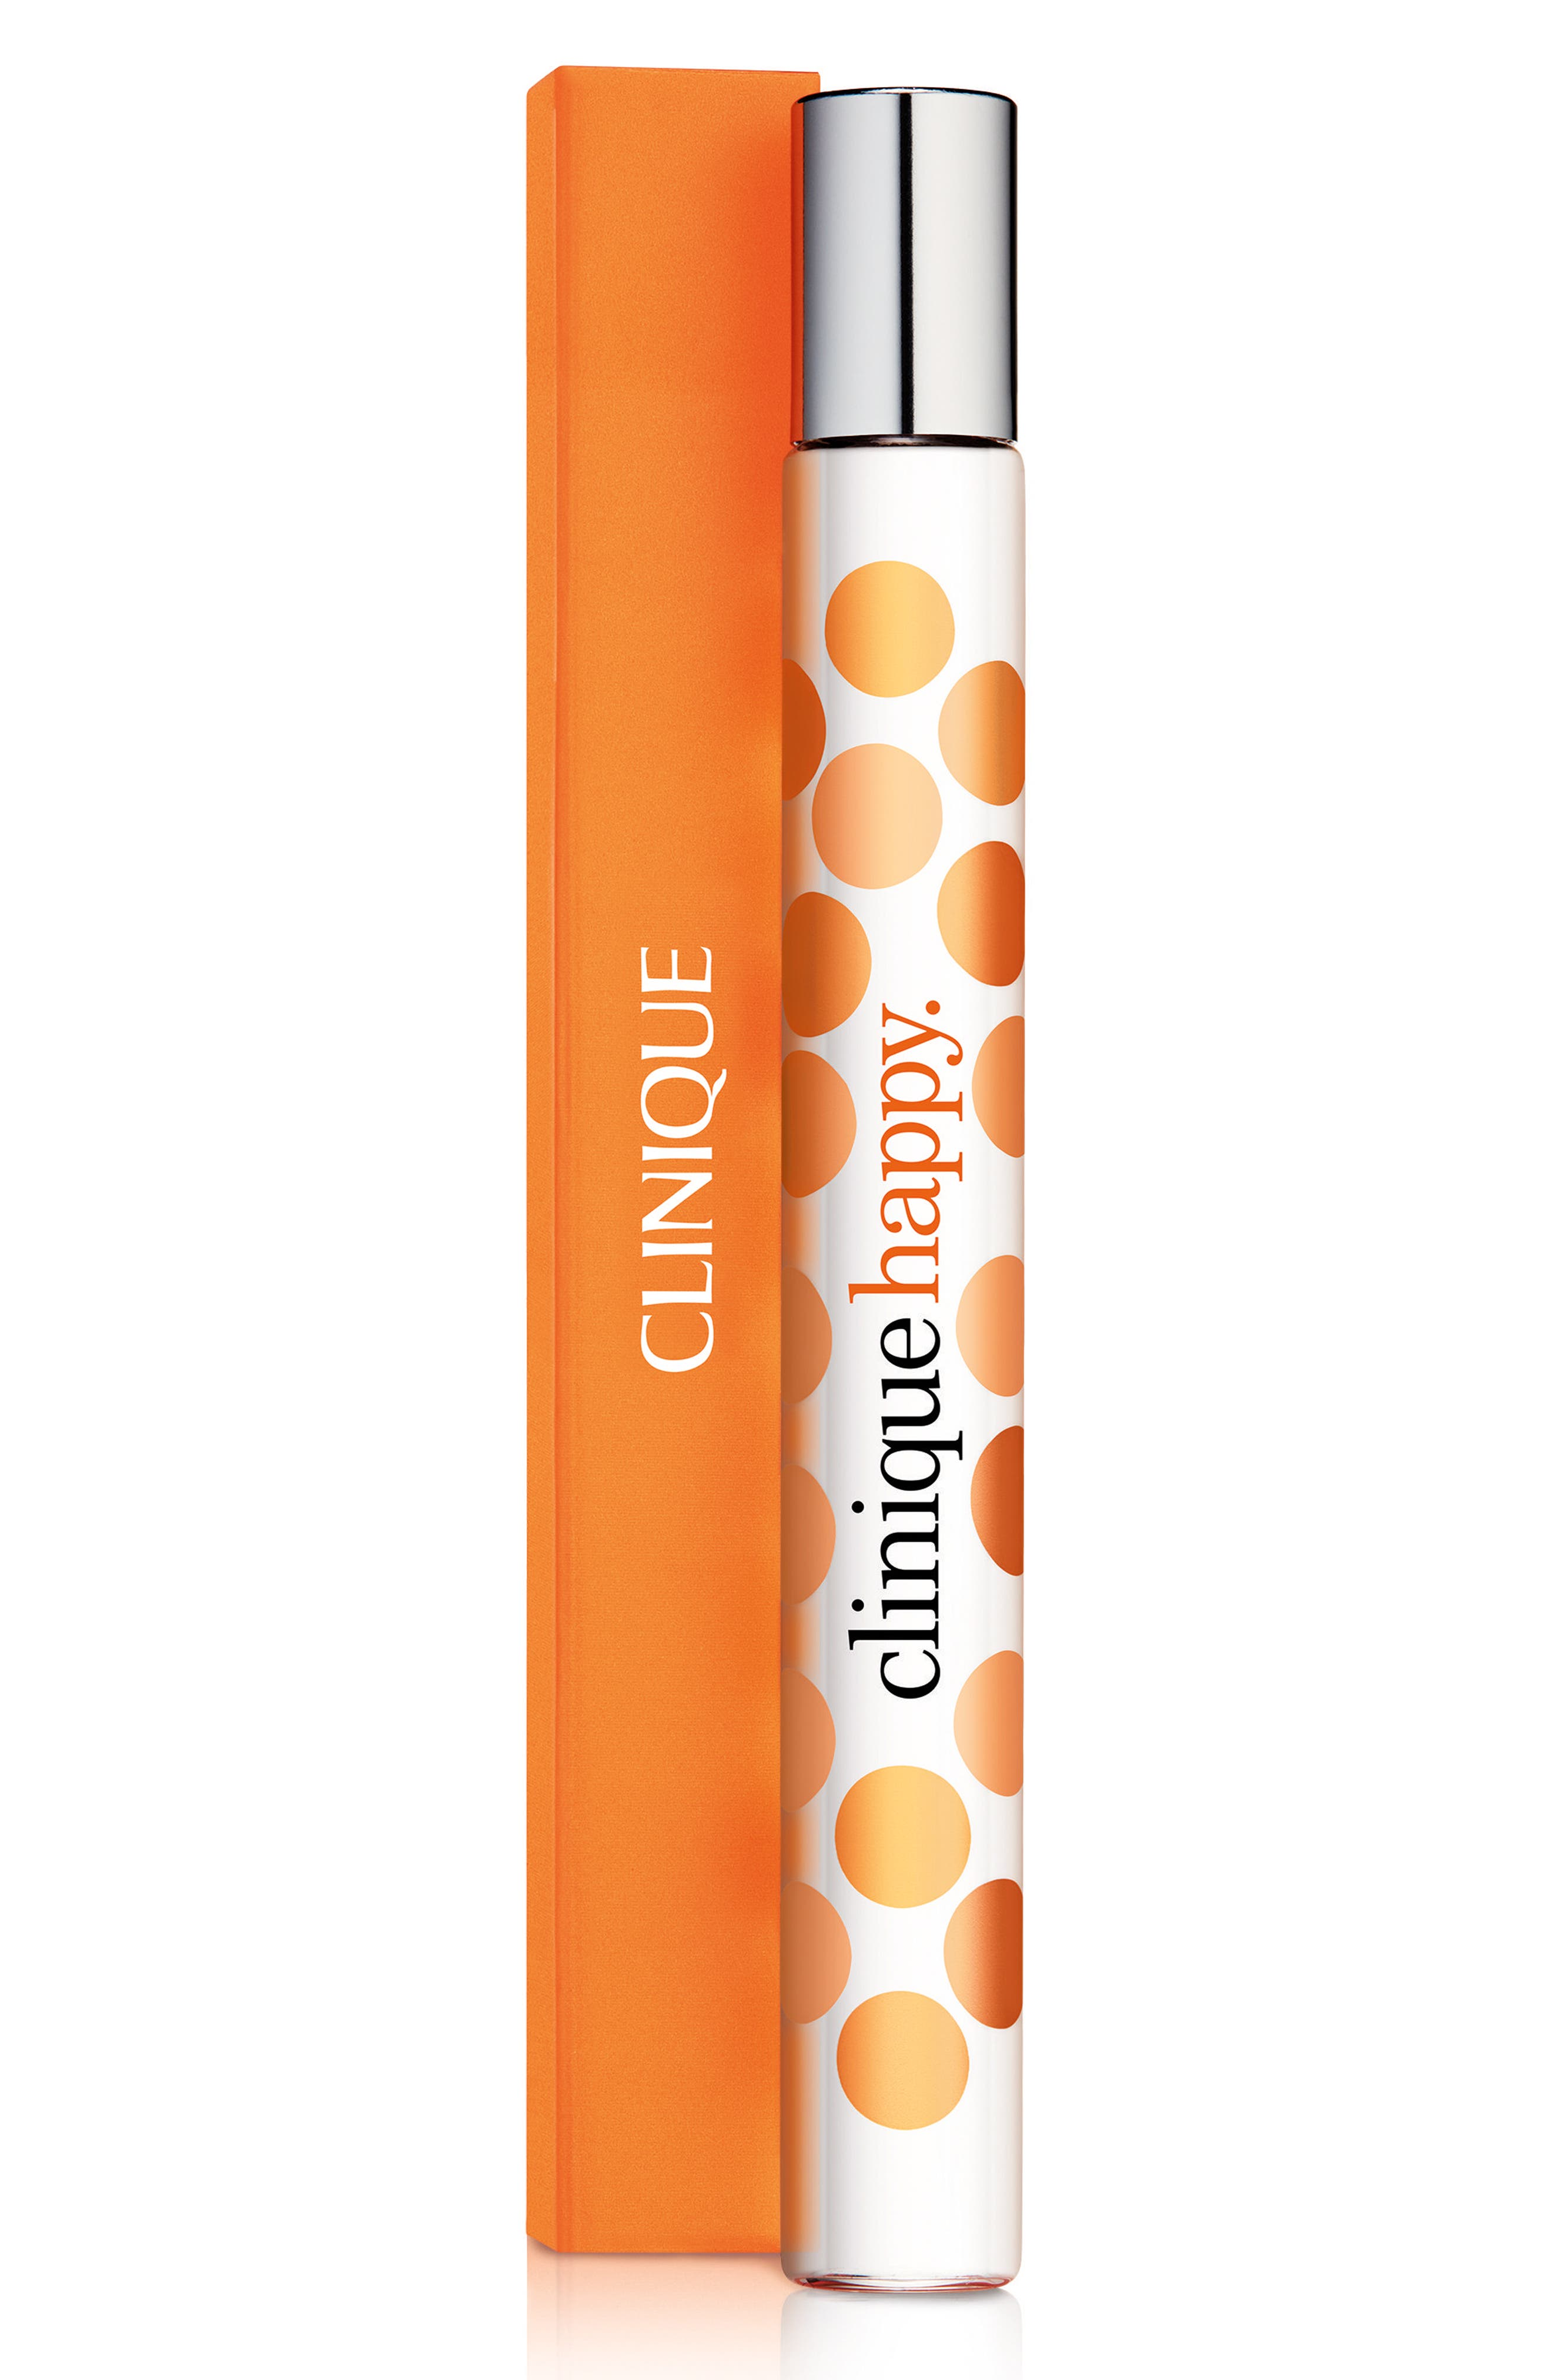 Clinique Happy Purse Spray (Limited Edition)